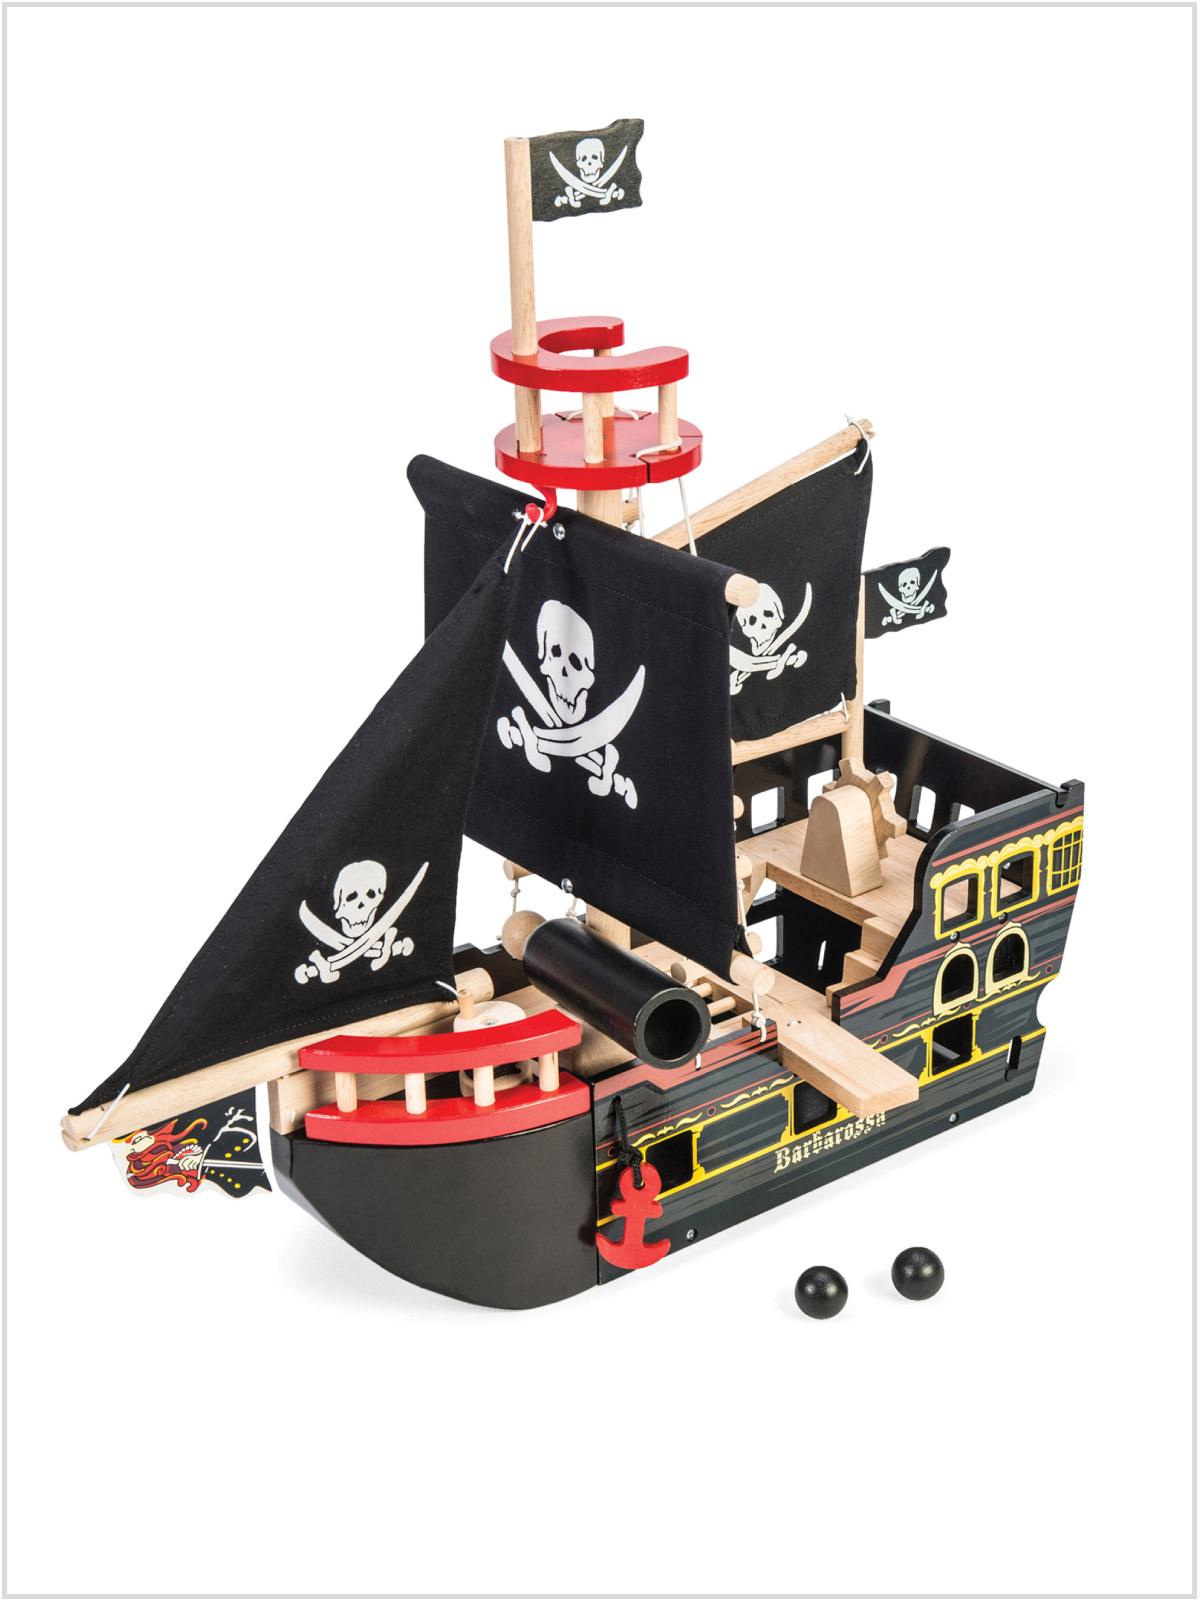 frederickandsophie-toys-letoyvan-wooden-pirateship-barbarossa